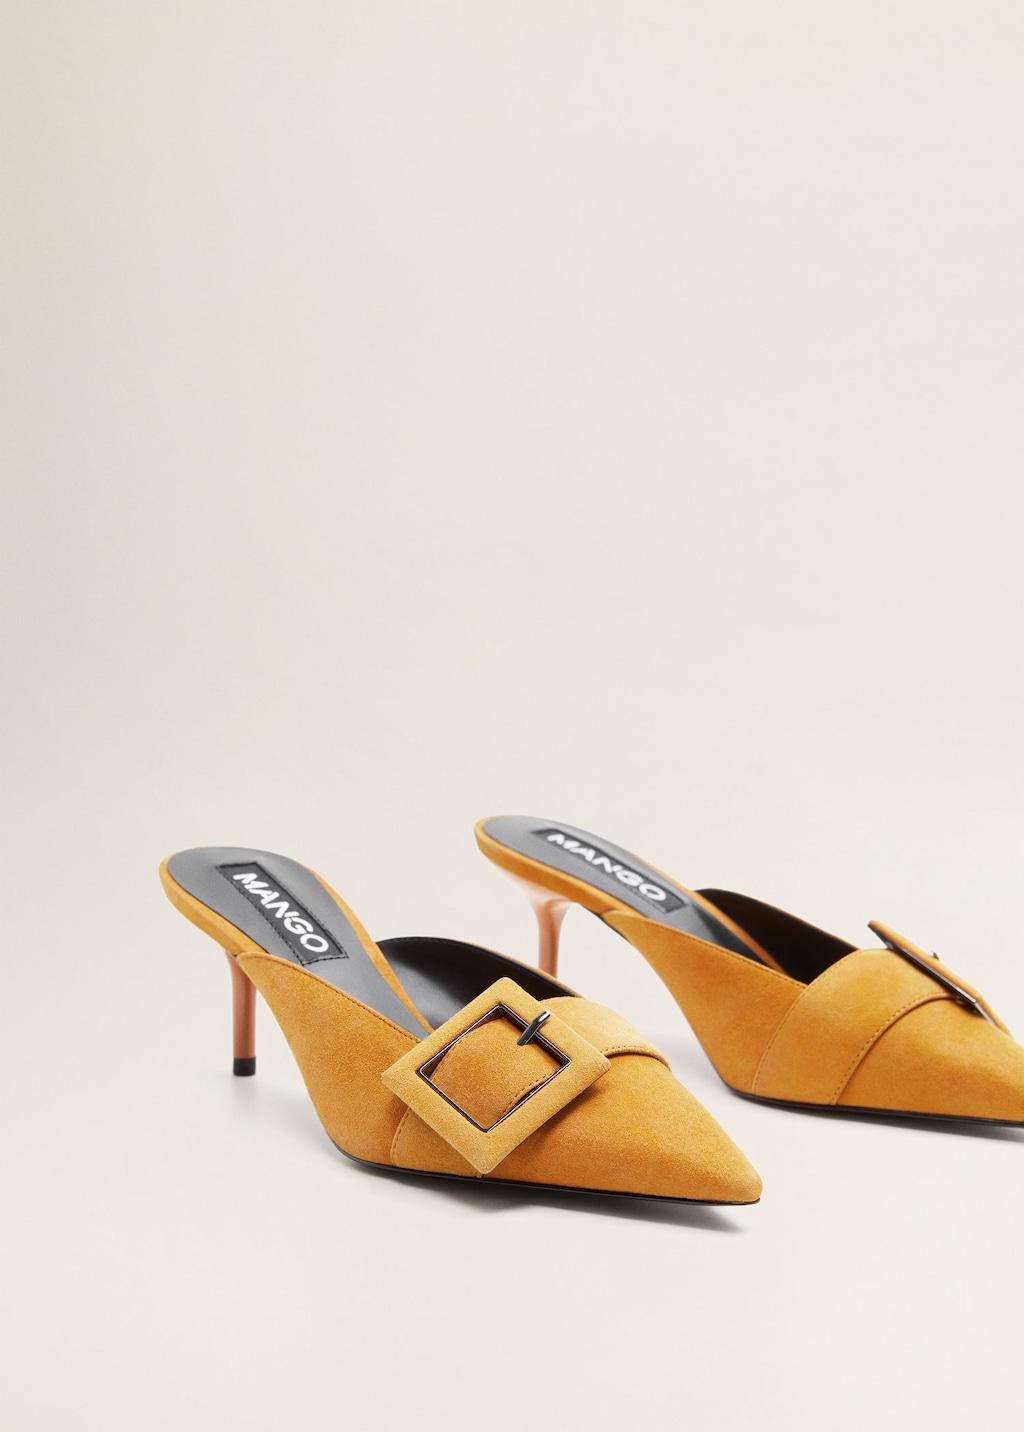 mango tokali deri ayakkabi